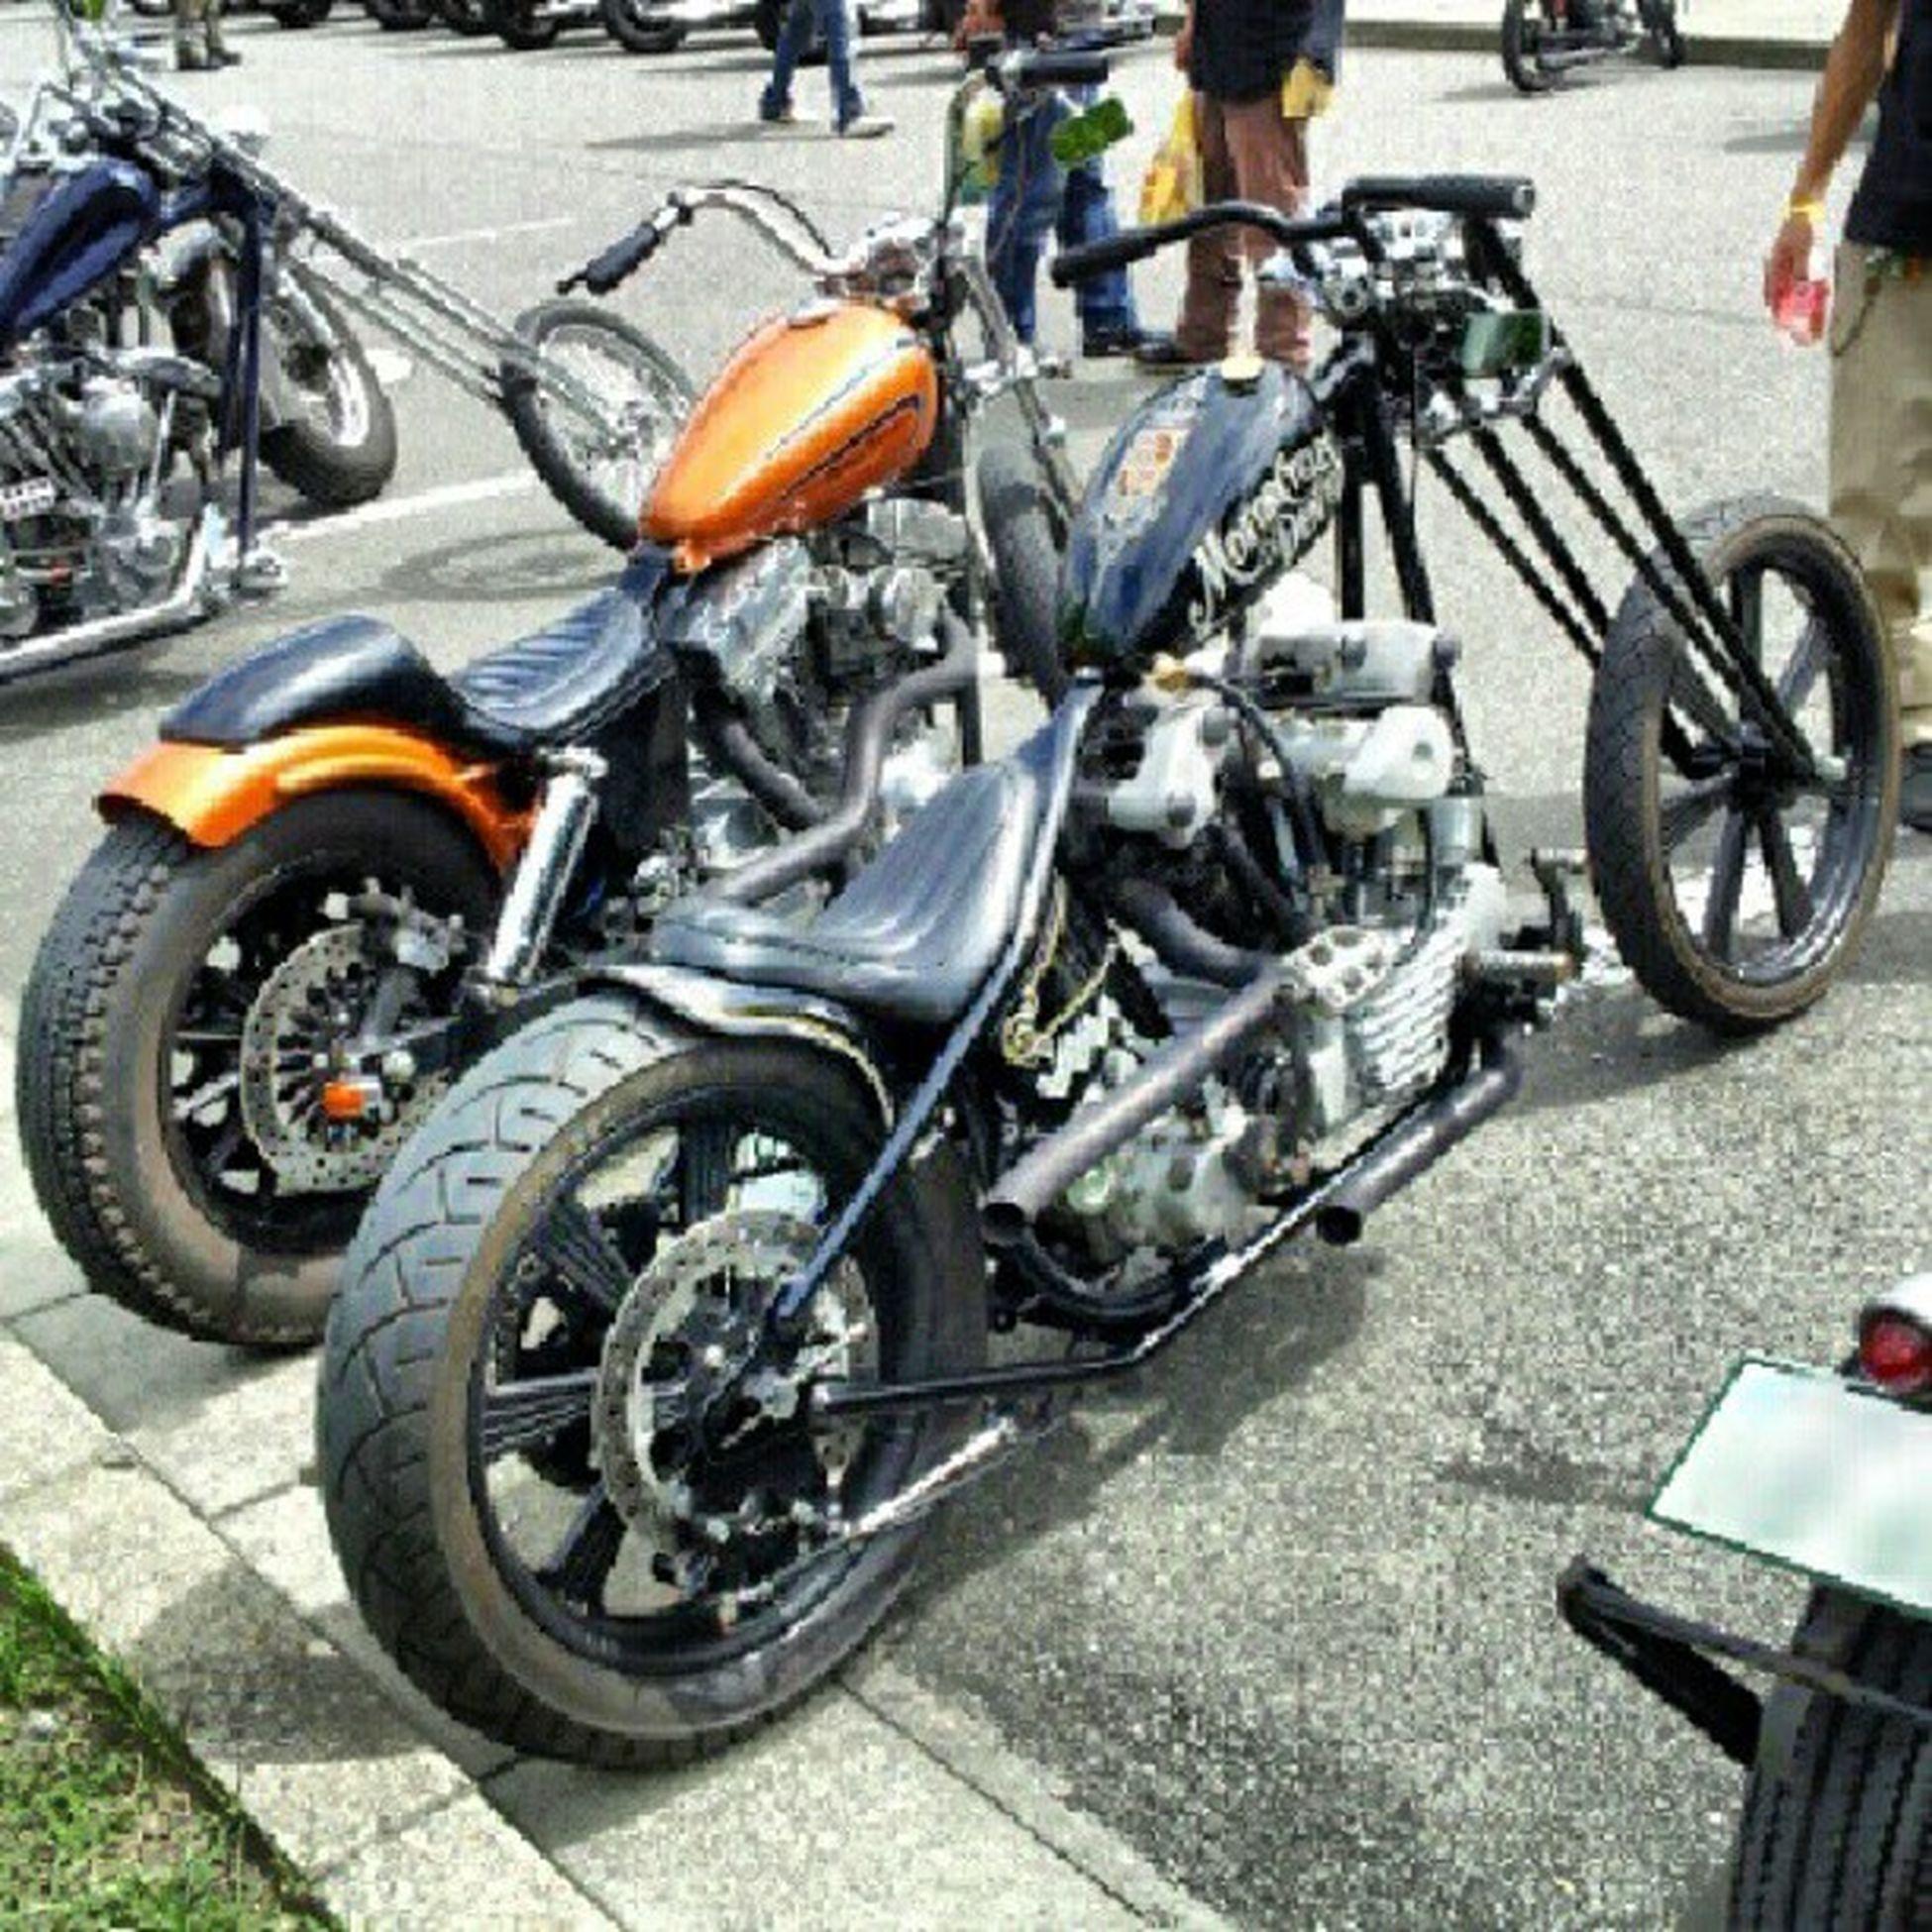 superweekend parking Harleydavidson Knucklehead Sportser Chopper bobber